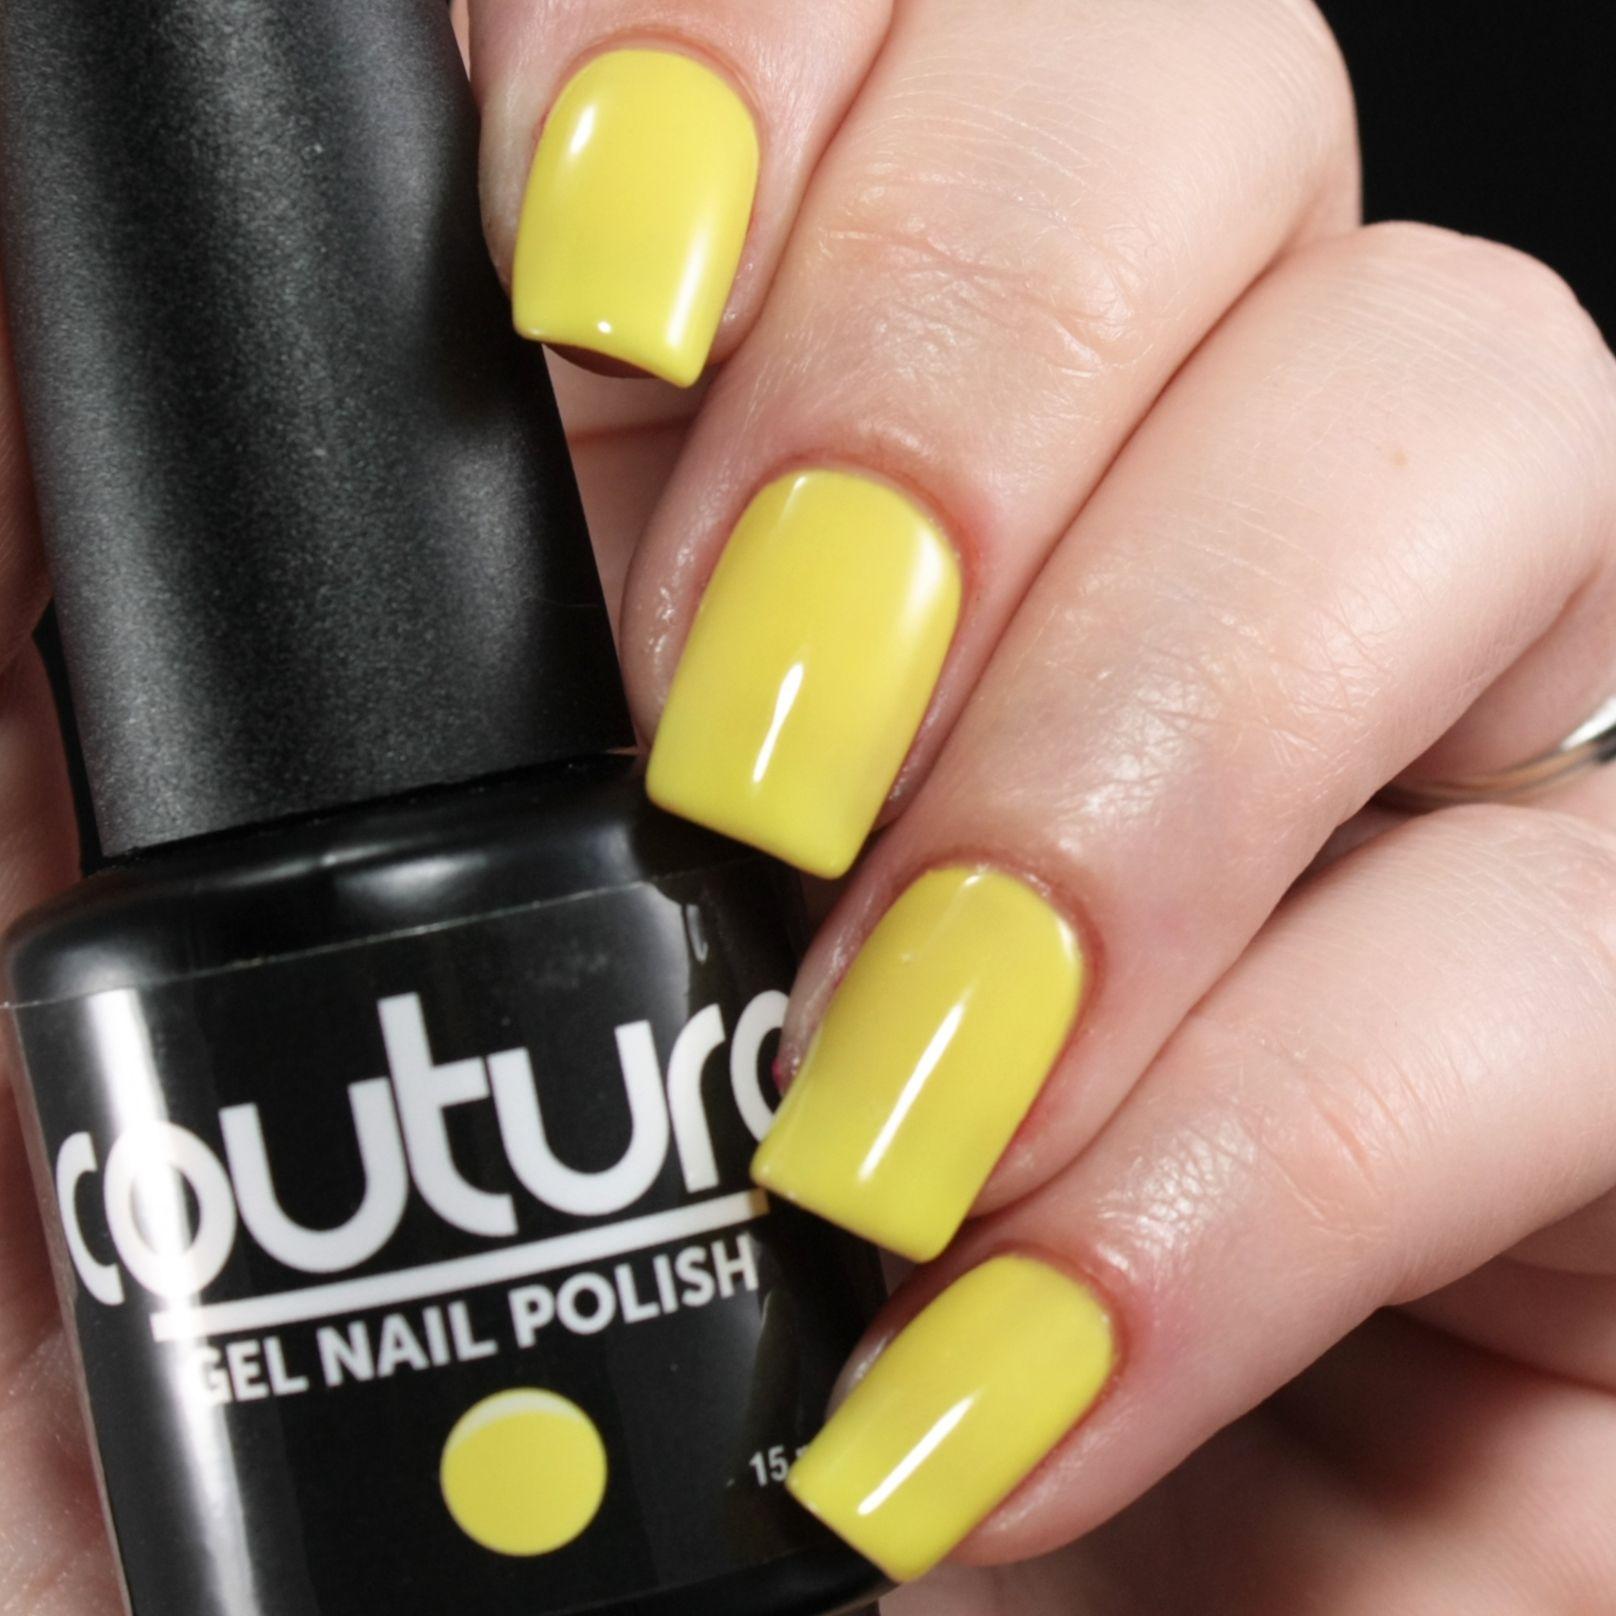 Best gel nail polish color for summer